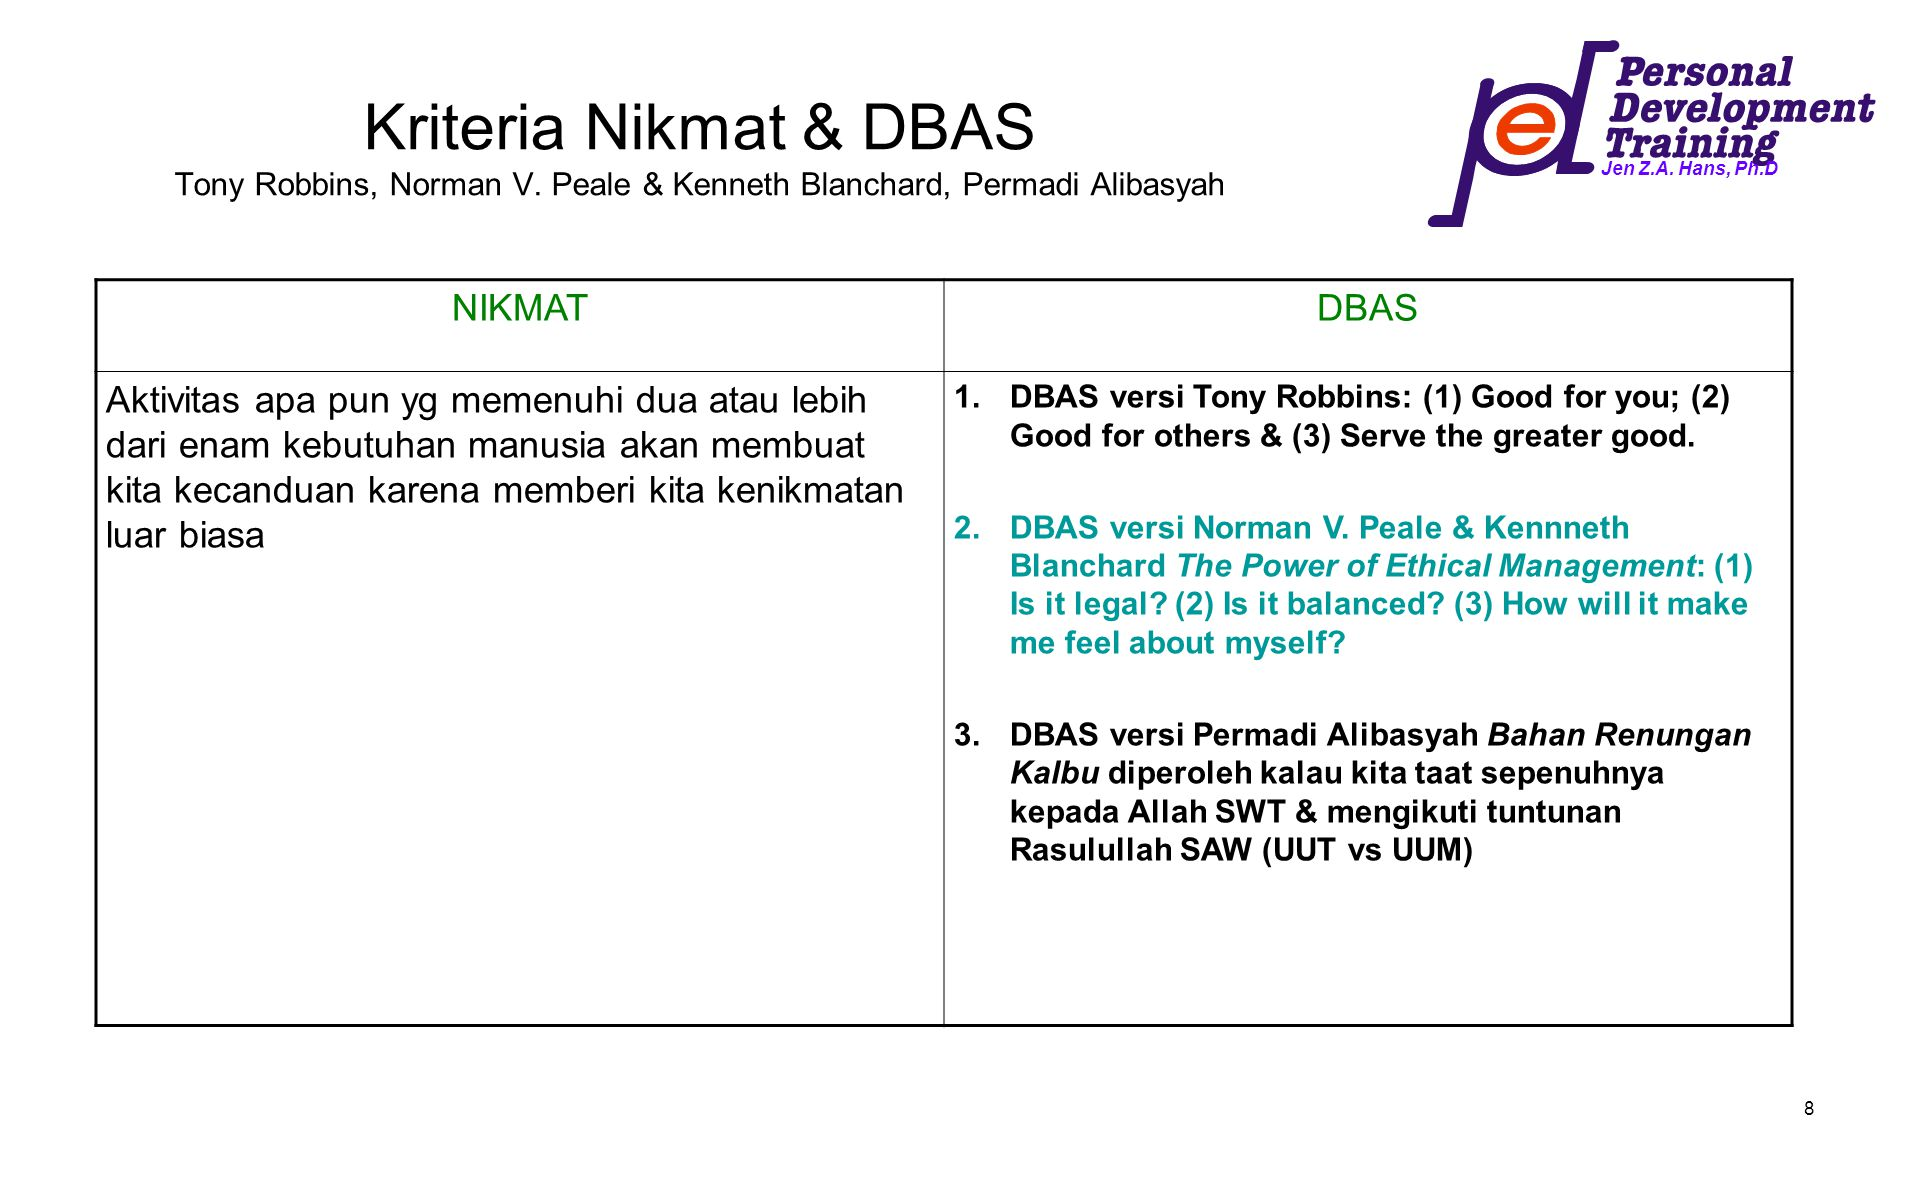 Kriteria Nikmat & DBAS Tony Robbins, Norman V